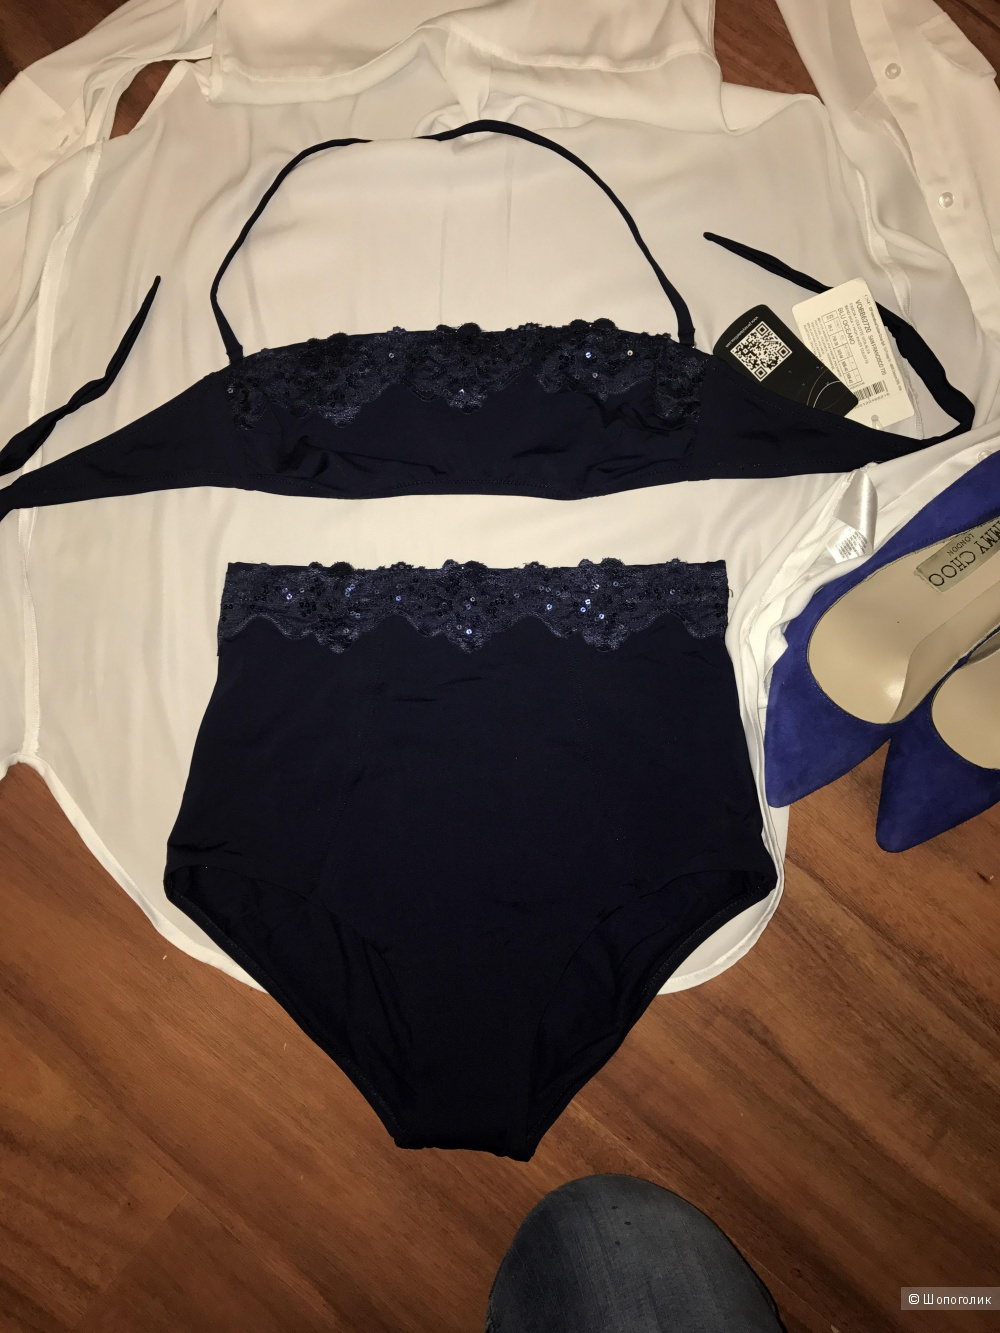 Абсолютно новый купальник бренд OROBLU Jersey Lomellina San Francisco цвет темно-синий размер 75B-38 Италия